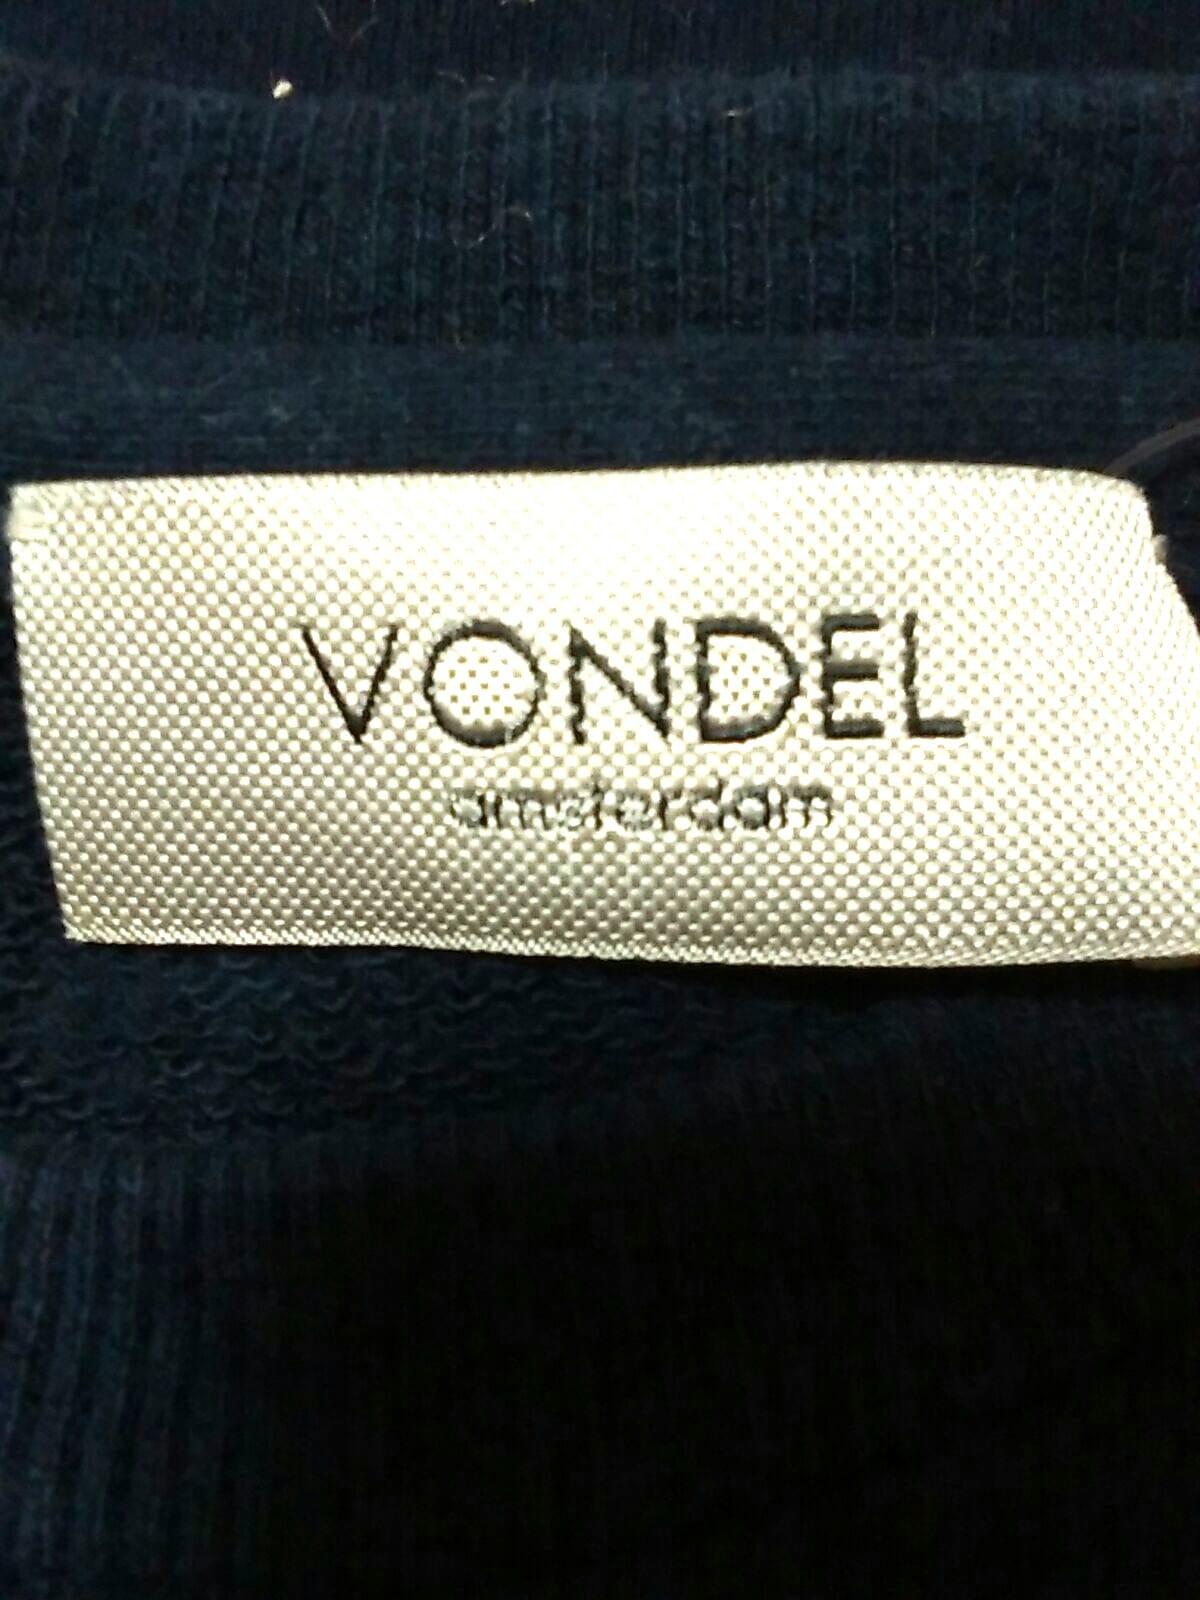 VONDEL(フォンデル)のトレーナー